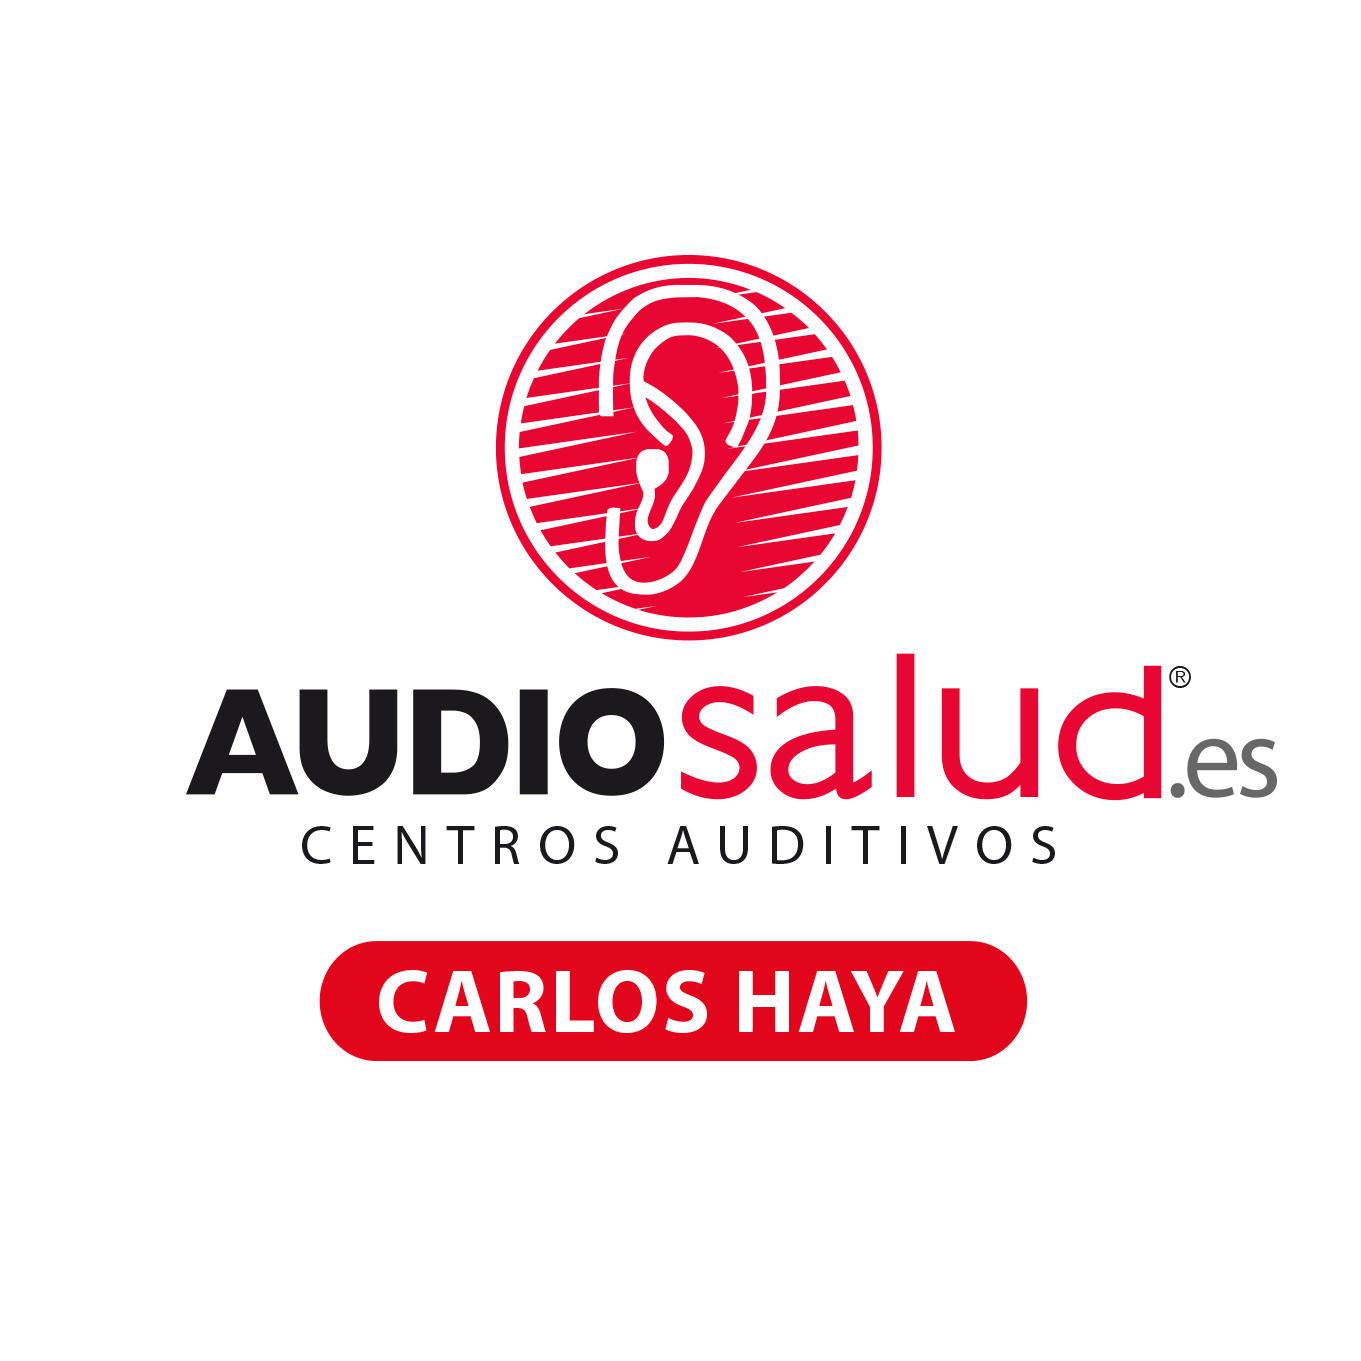 Audiosalud Carlos Haya - Centro Auditivo